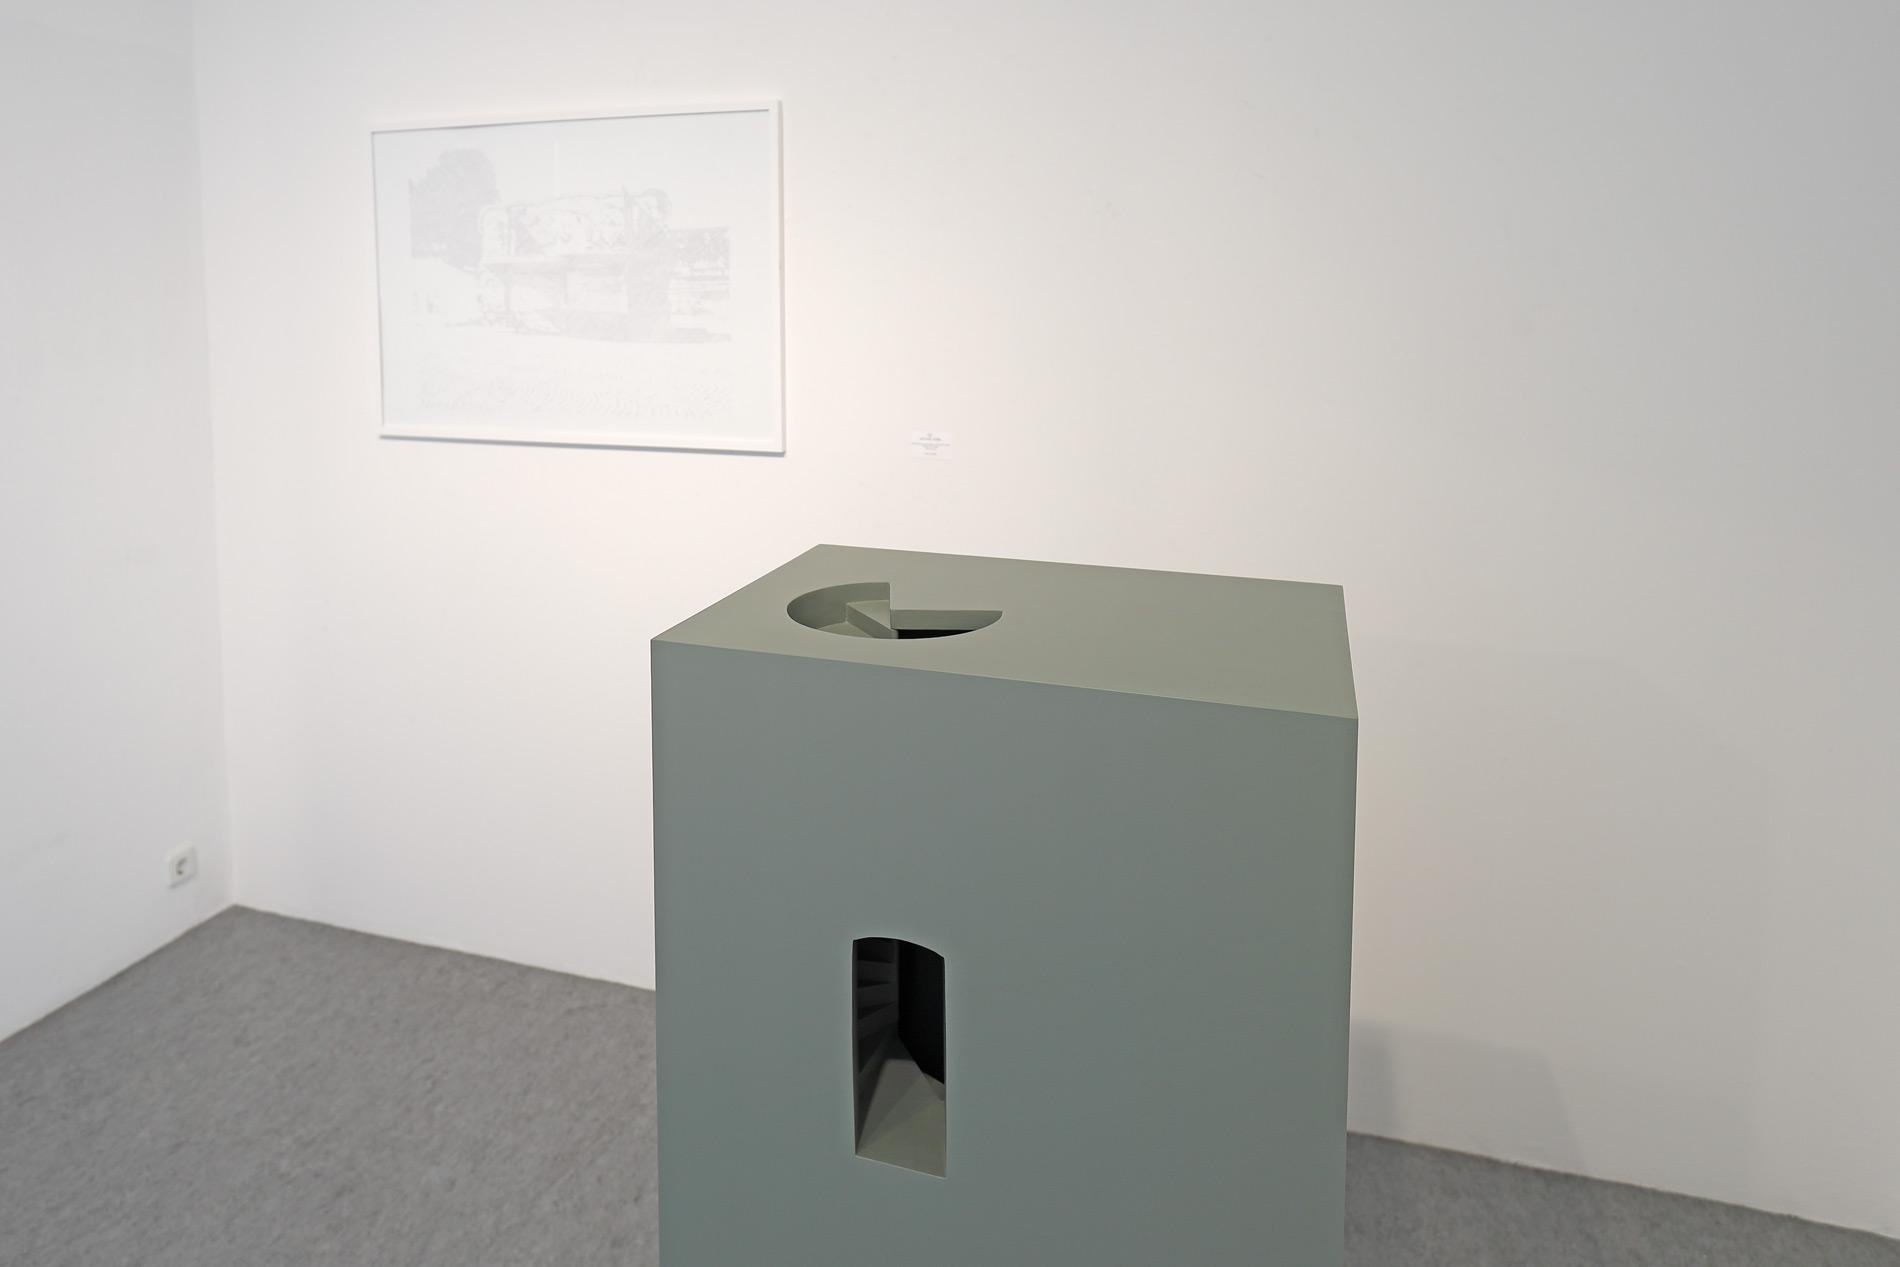 Galerie Löhrl - Stufen + Luna Park